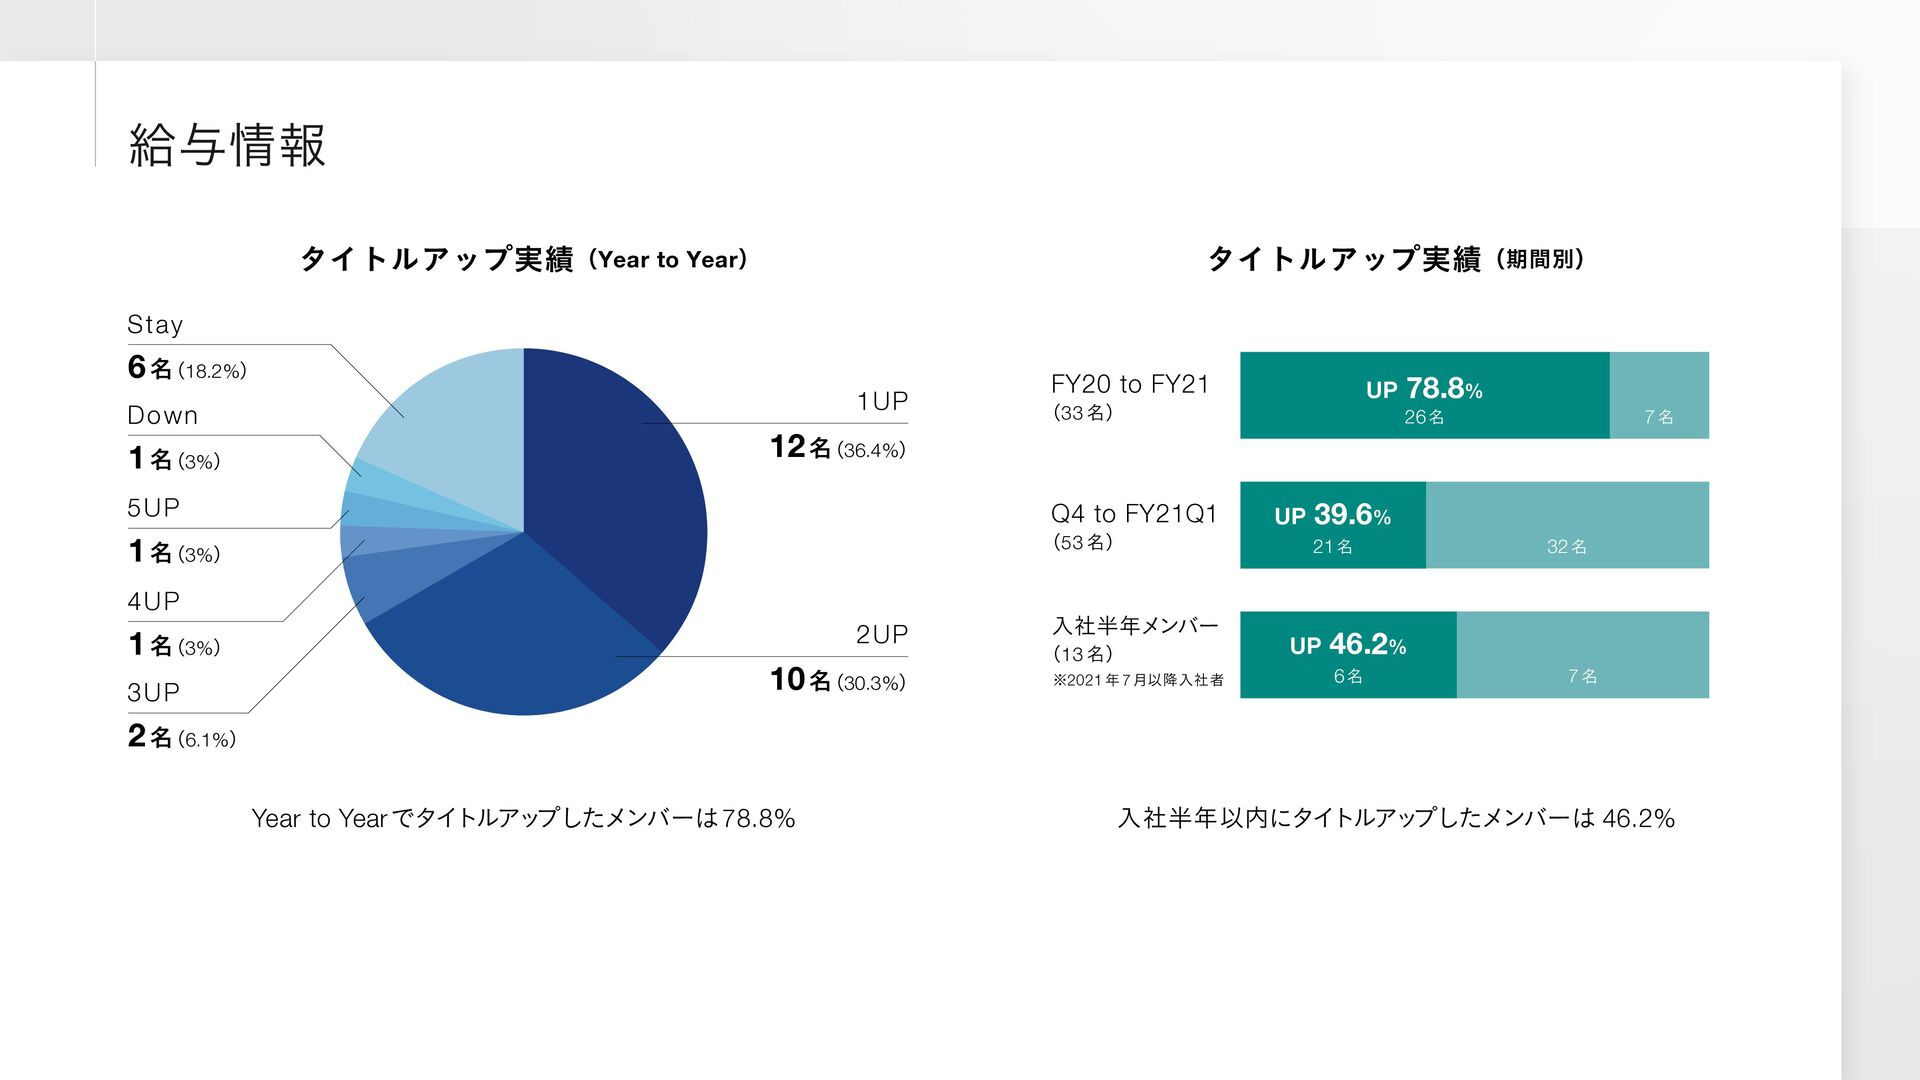 Challenge 01 ਓͱςΫϊϩδʔͷྗΛ݁ू͠ɺ ABM ϓϥοτϑΥʔϜ͔Β ސ٬ઓ...